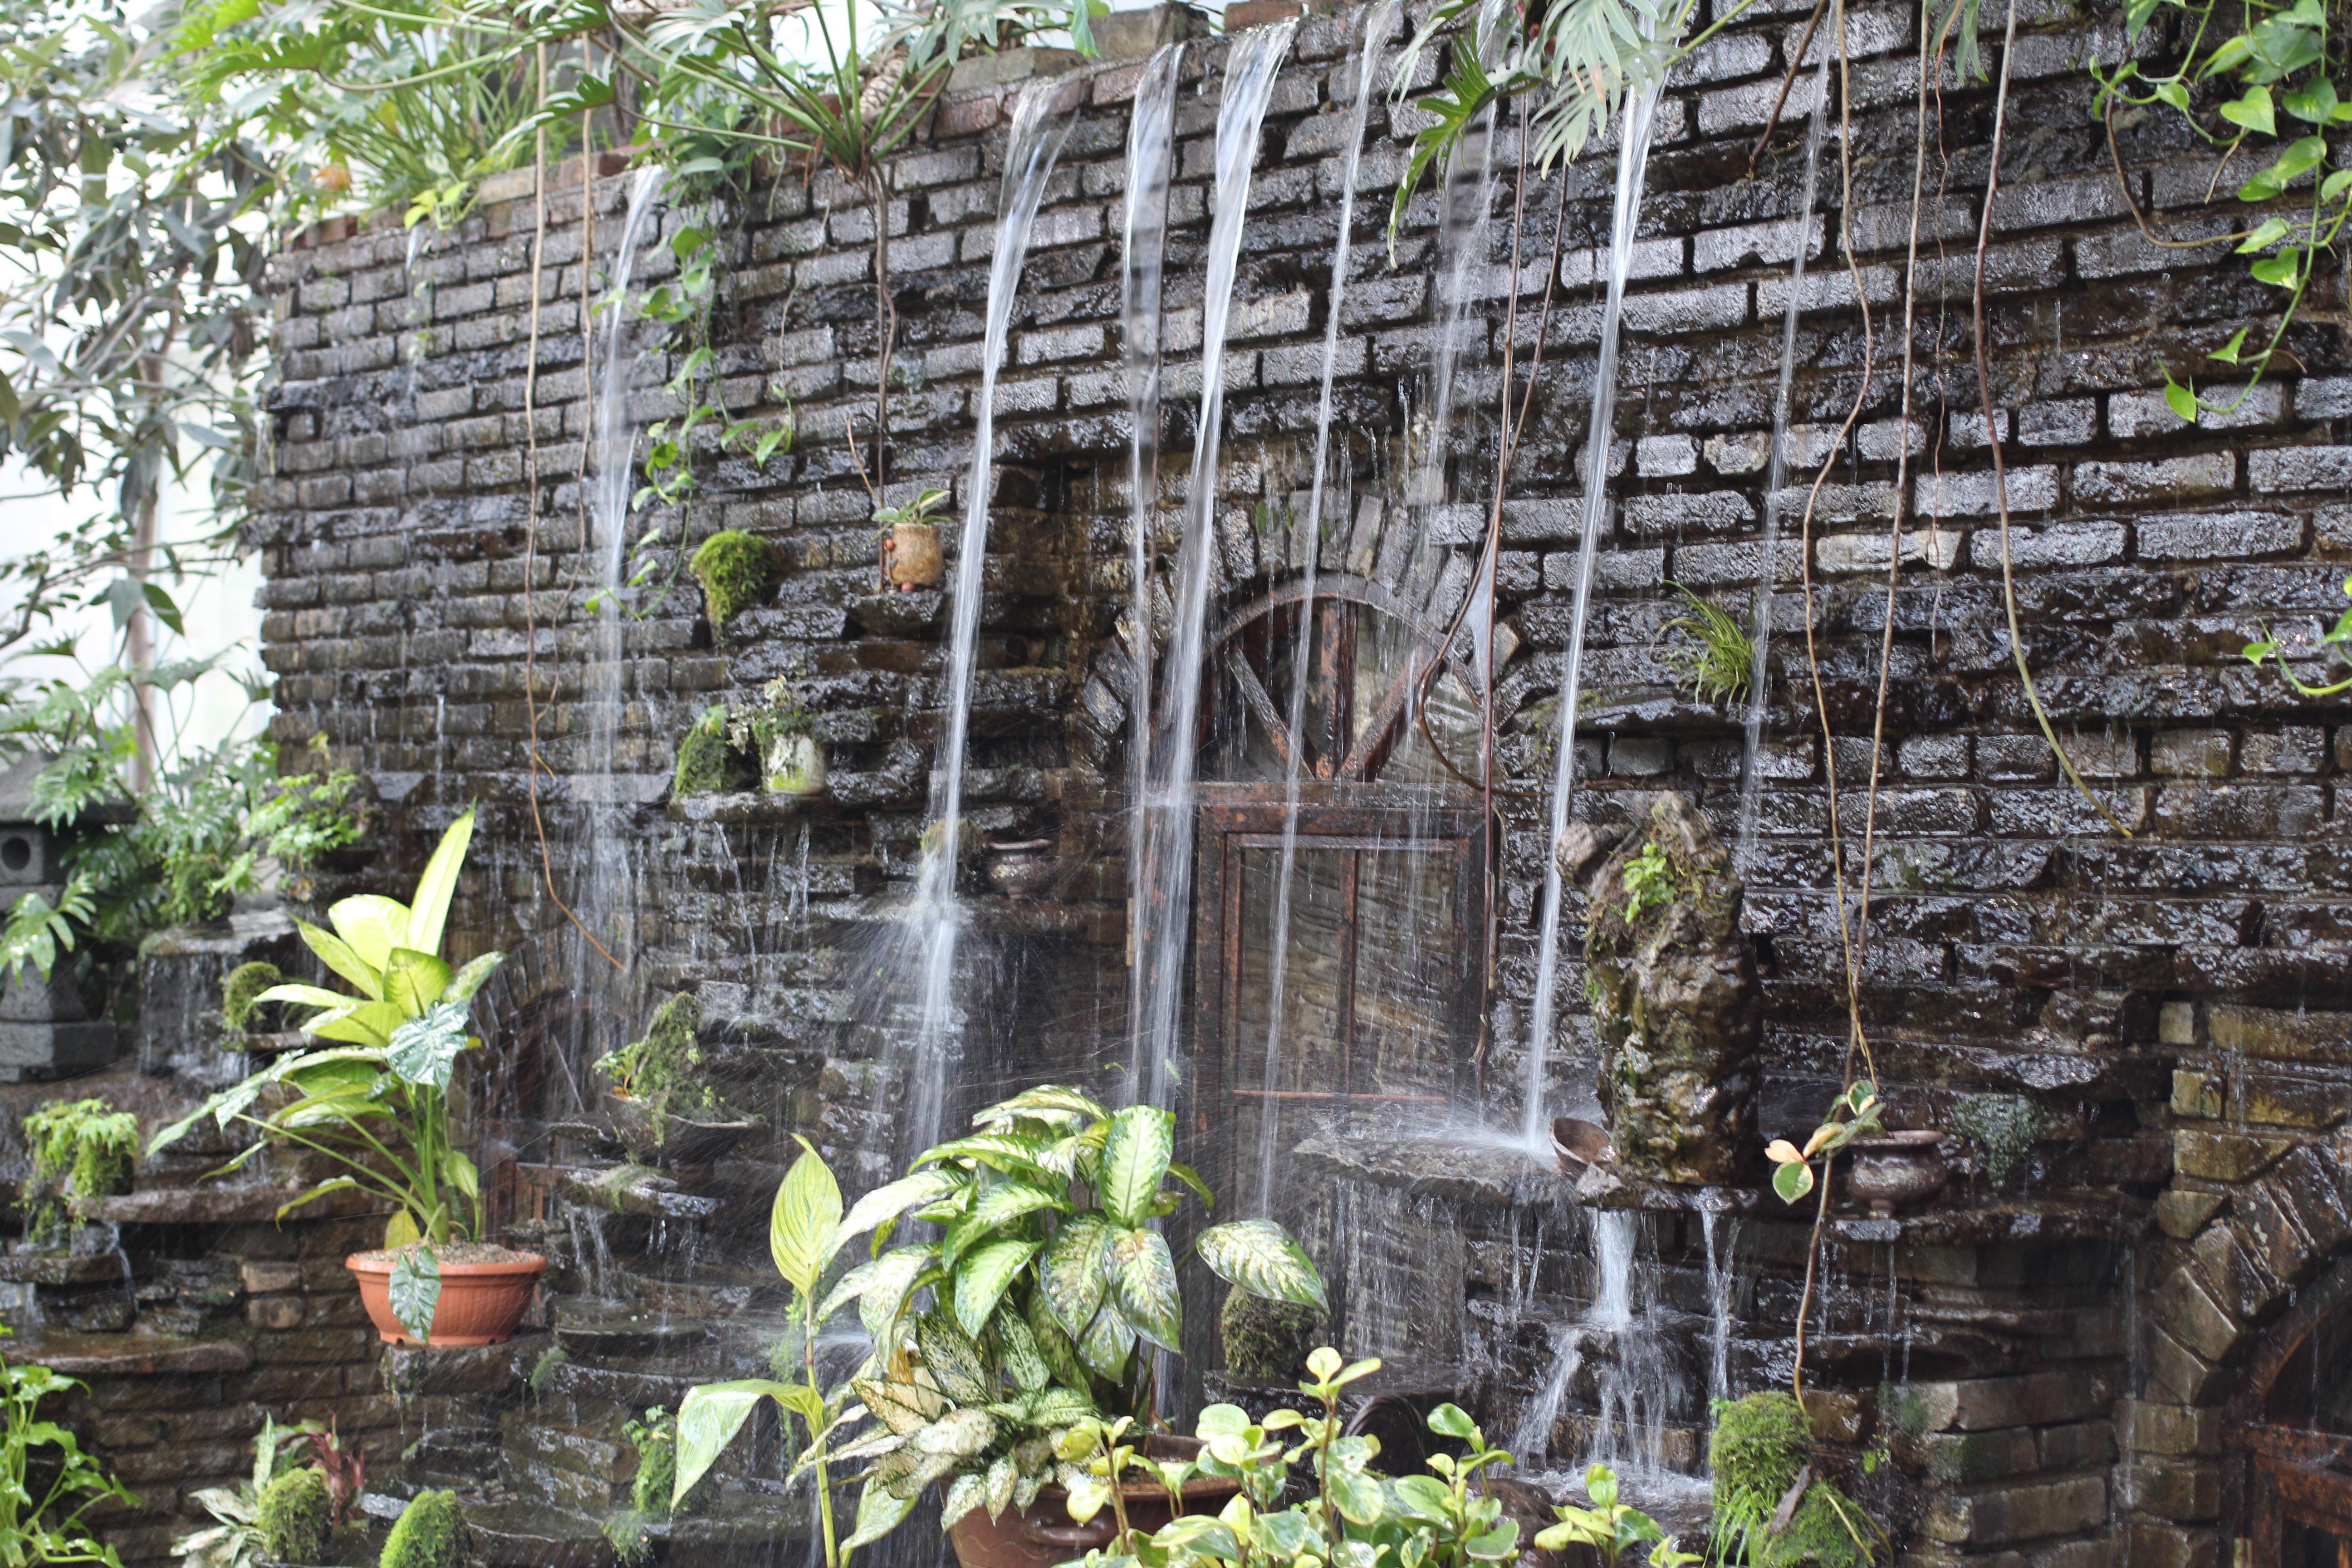 Stenen Muur Tuin : Gratis afbeeldingen oerwoud achtererf stenen muur tuin